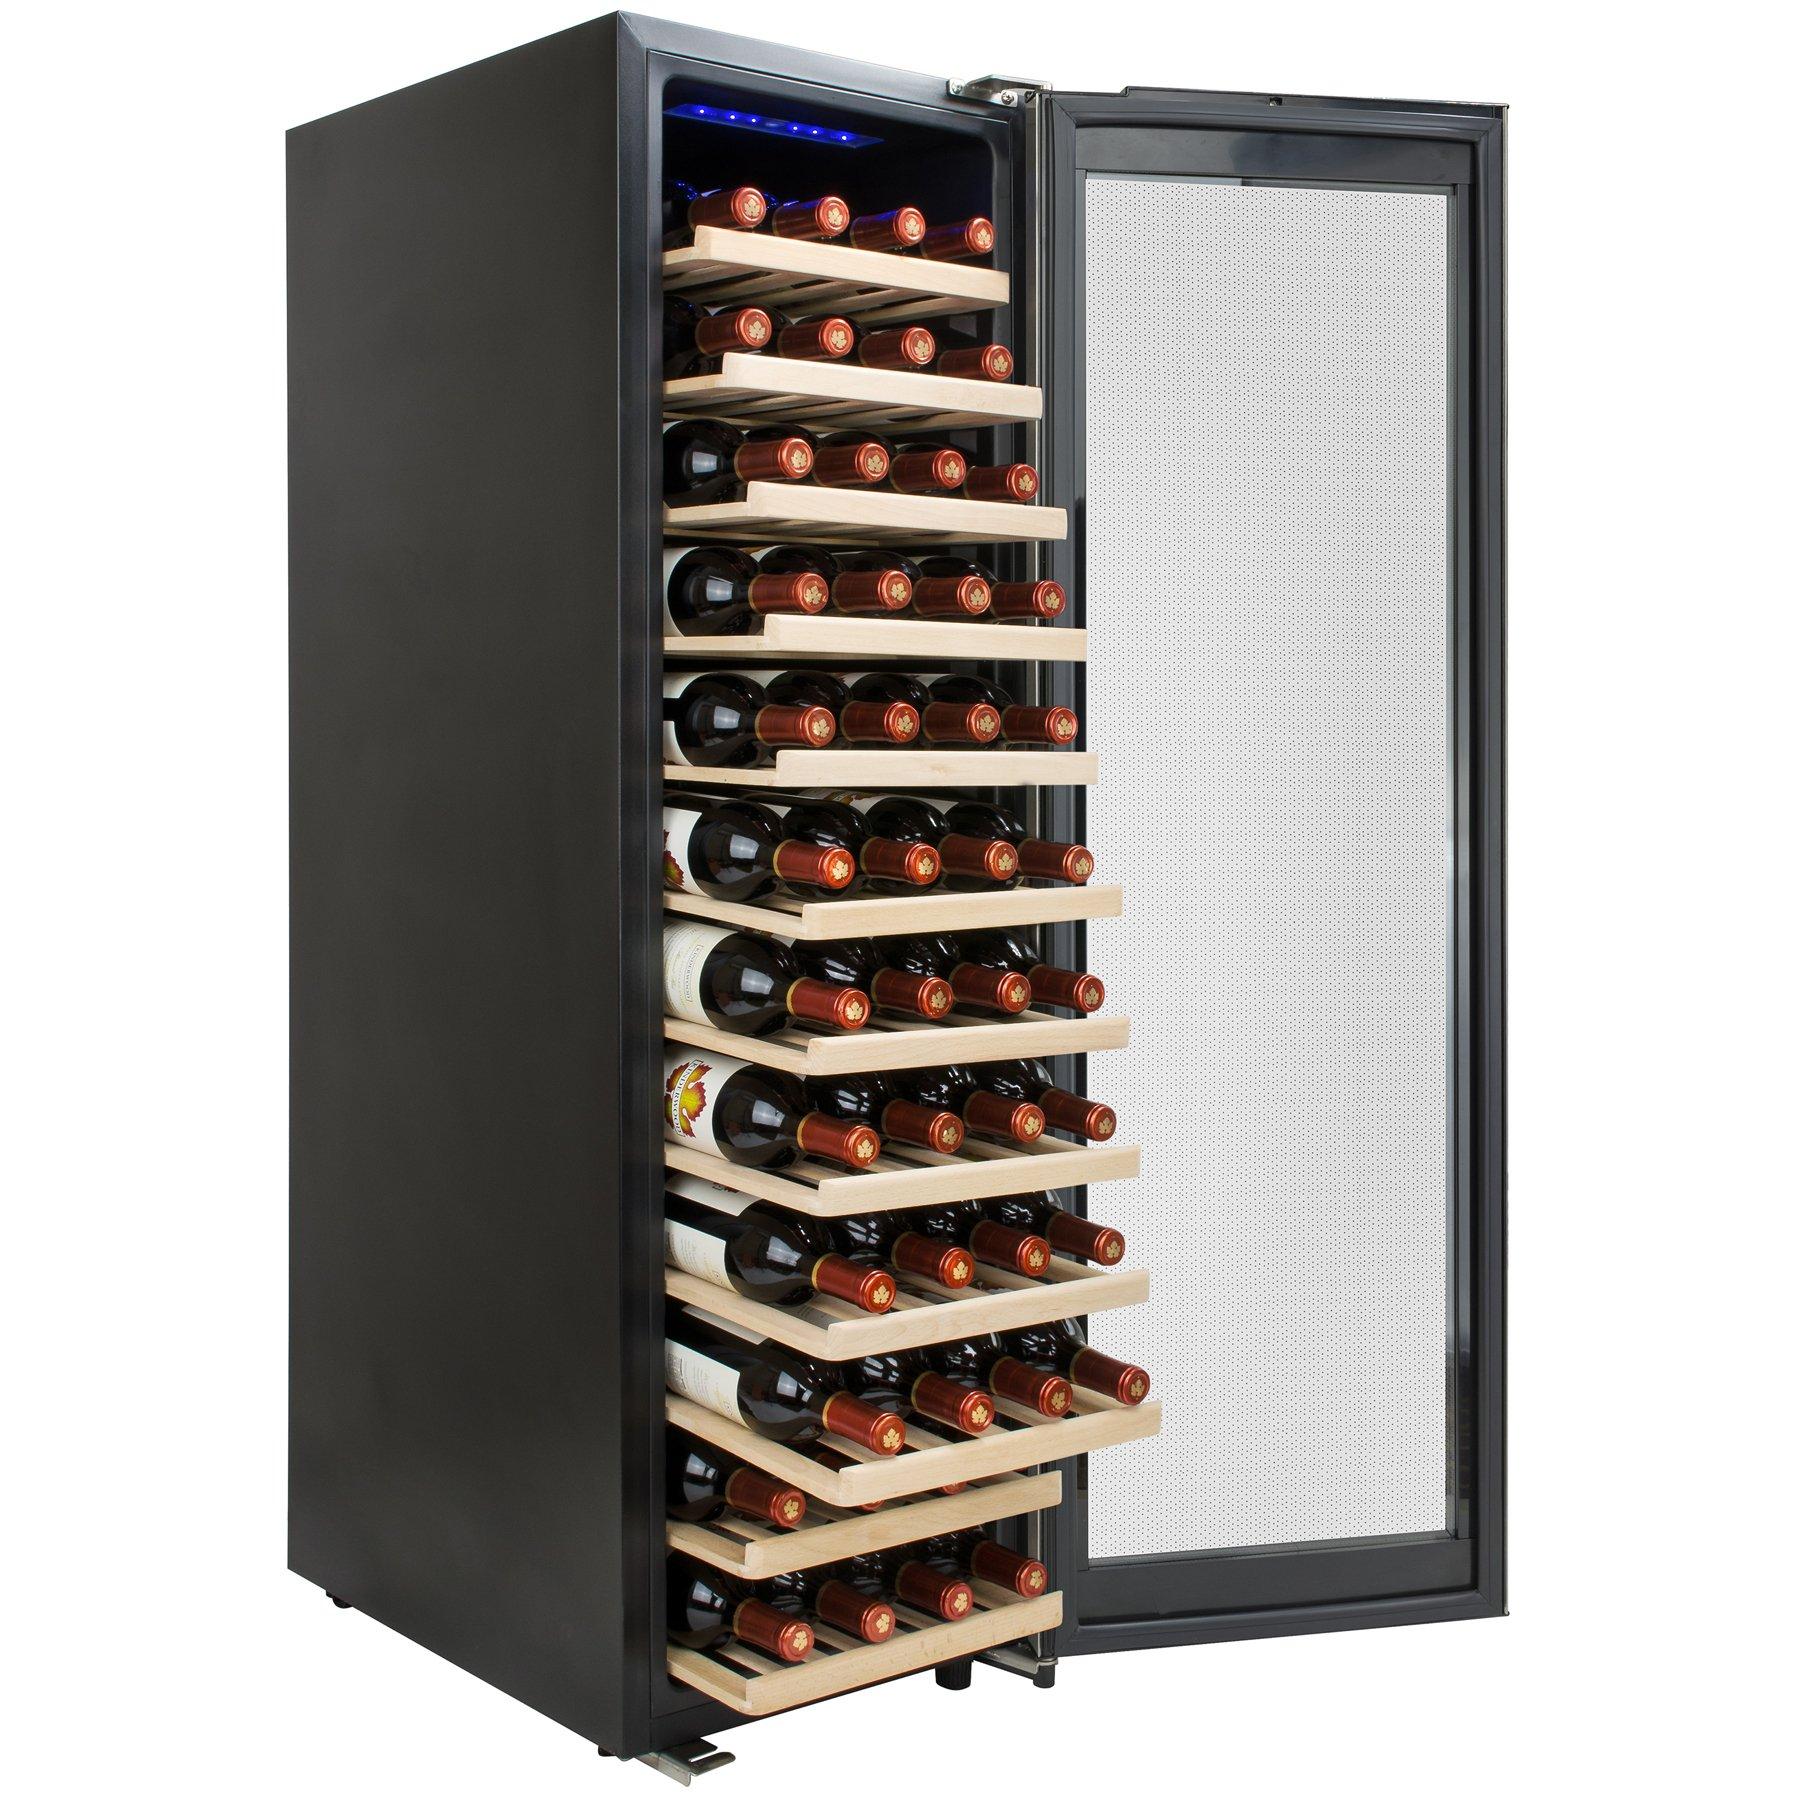 AKDY 58 Bottles Single Zone Compressor Within Freestanding Wine Cooler Refrigerator